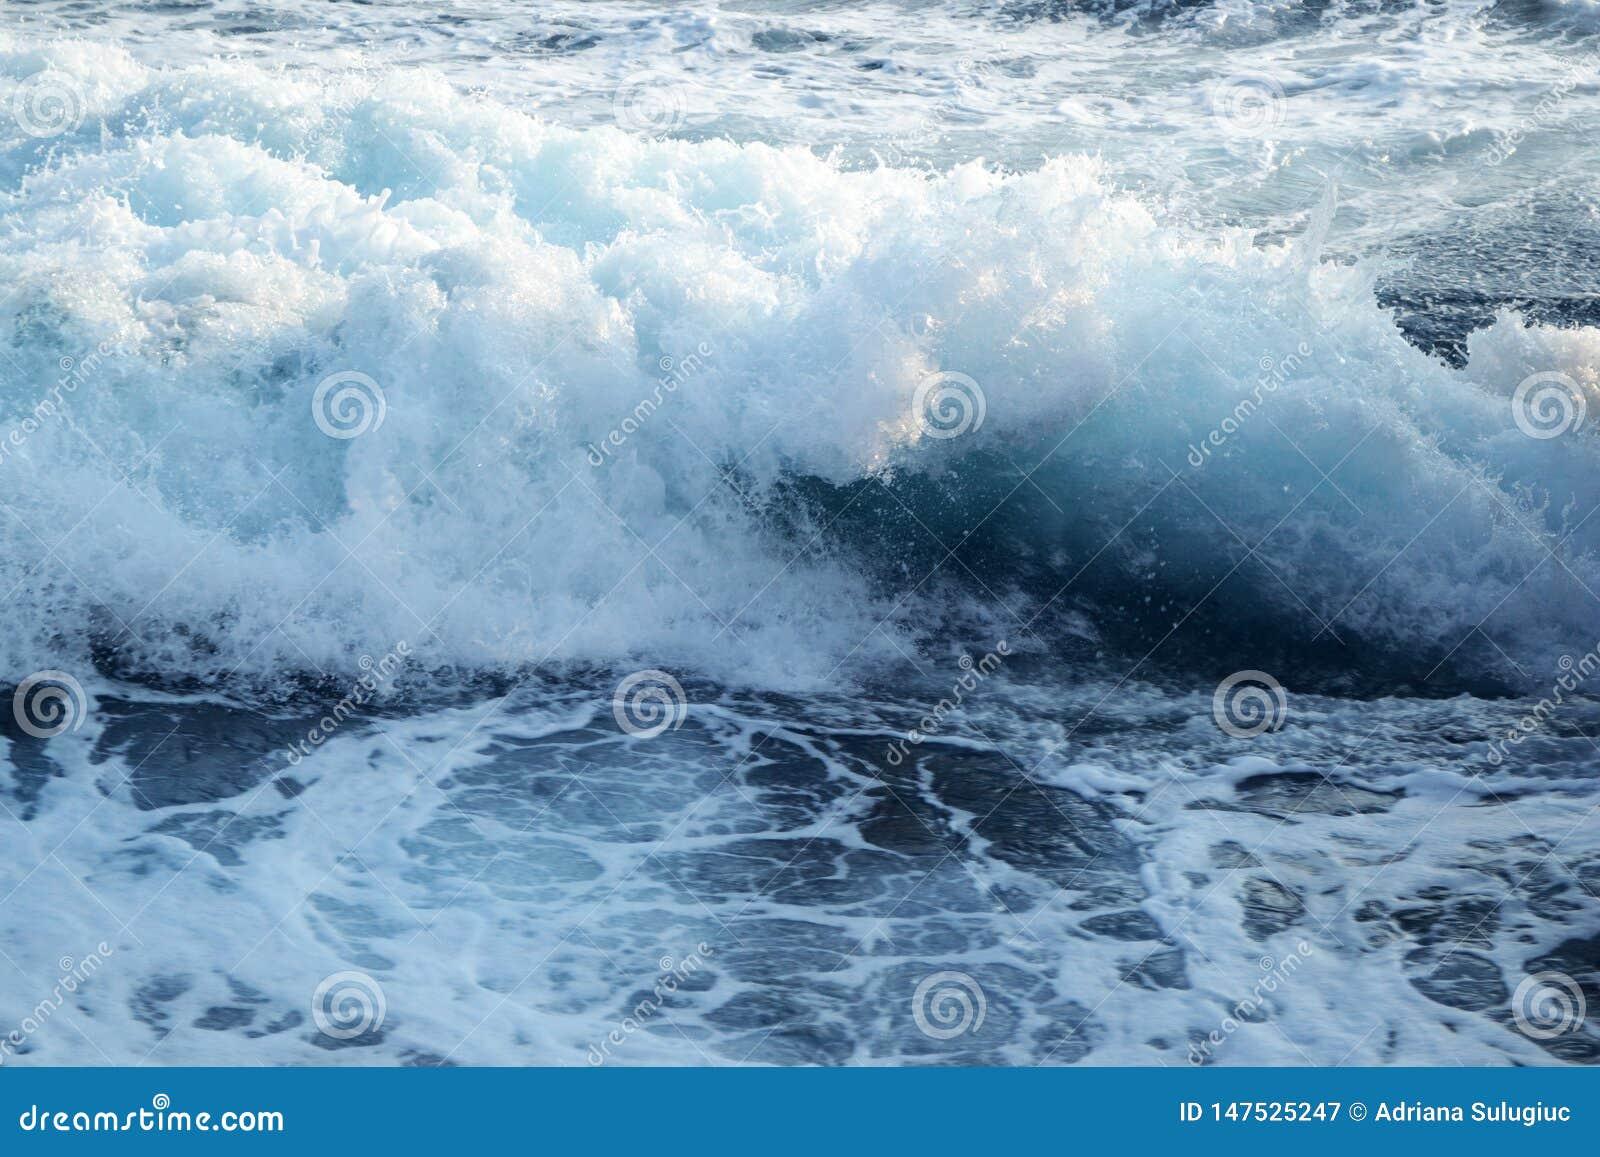 Onde arrabbiate fuori dal mare